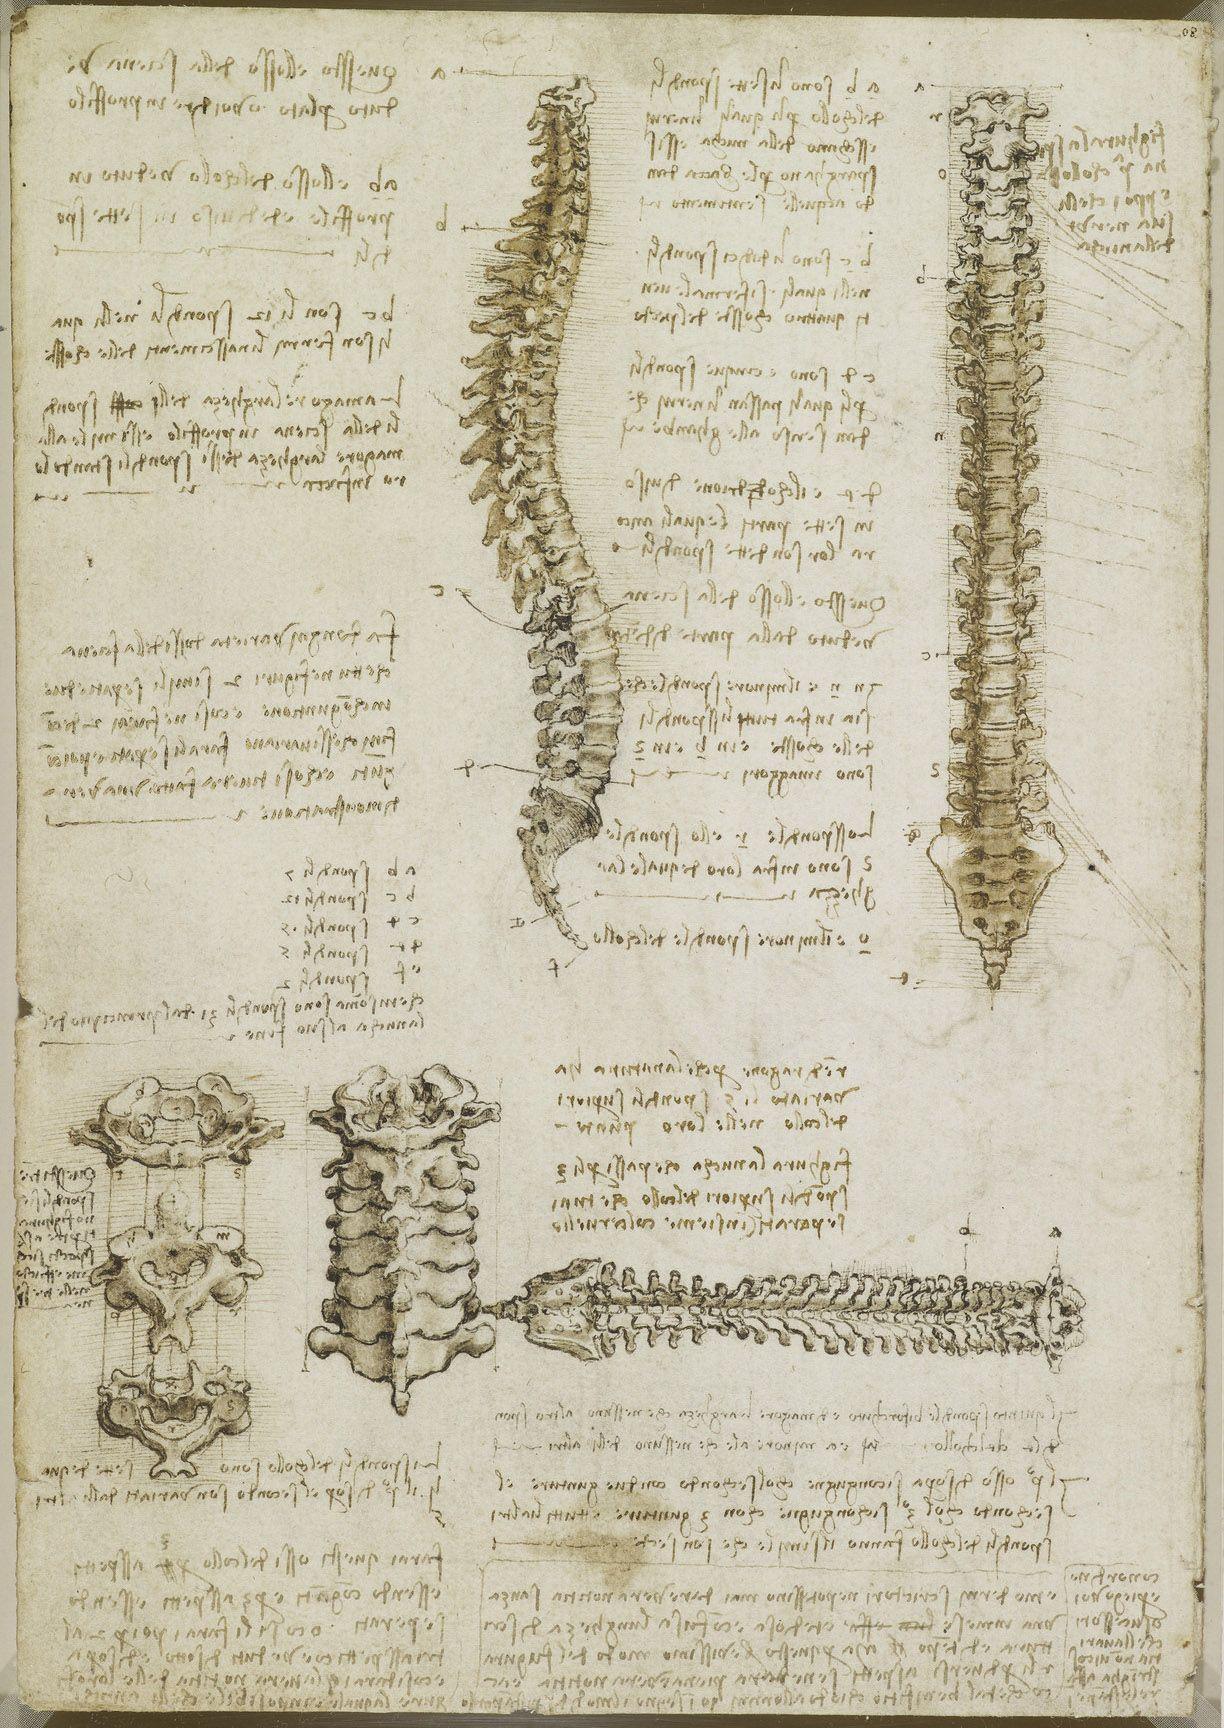 Leonardo da Vinci   Art/Nudes   Pinterest   Anatomy, Columns and ...